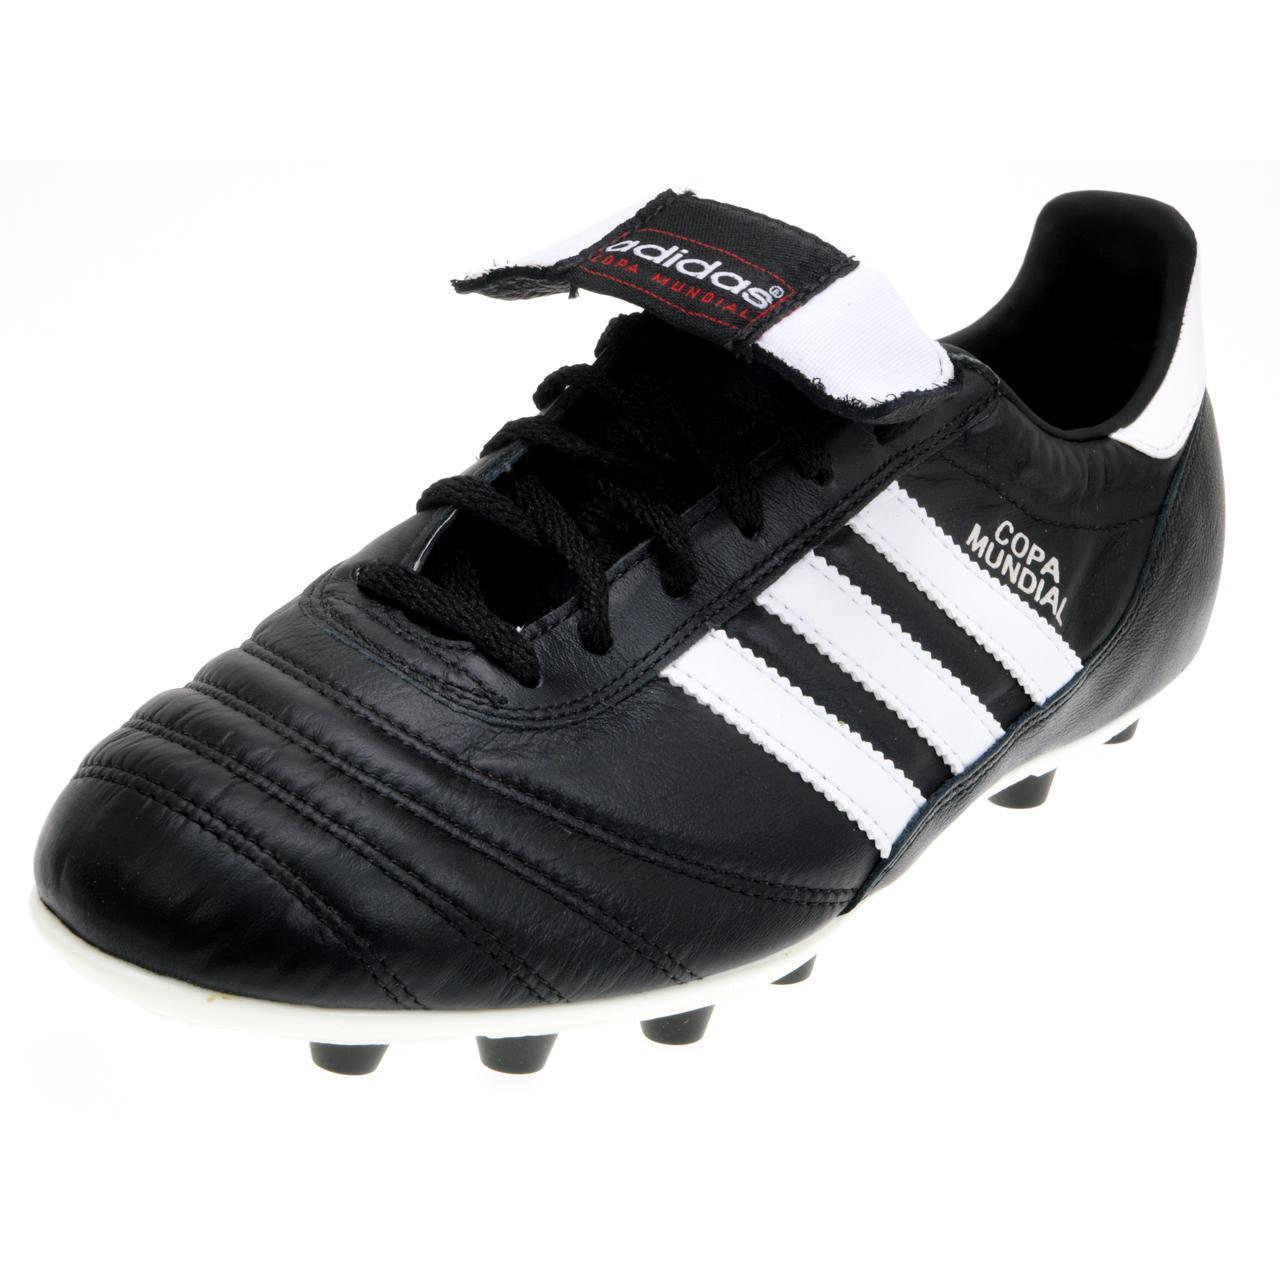 Chaussures football moulées Copa mundial petite taill Noir 22500